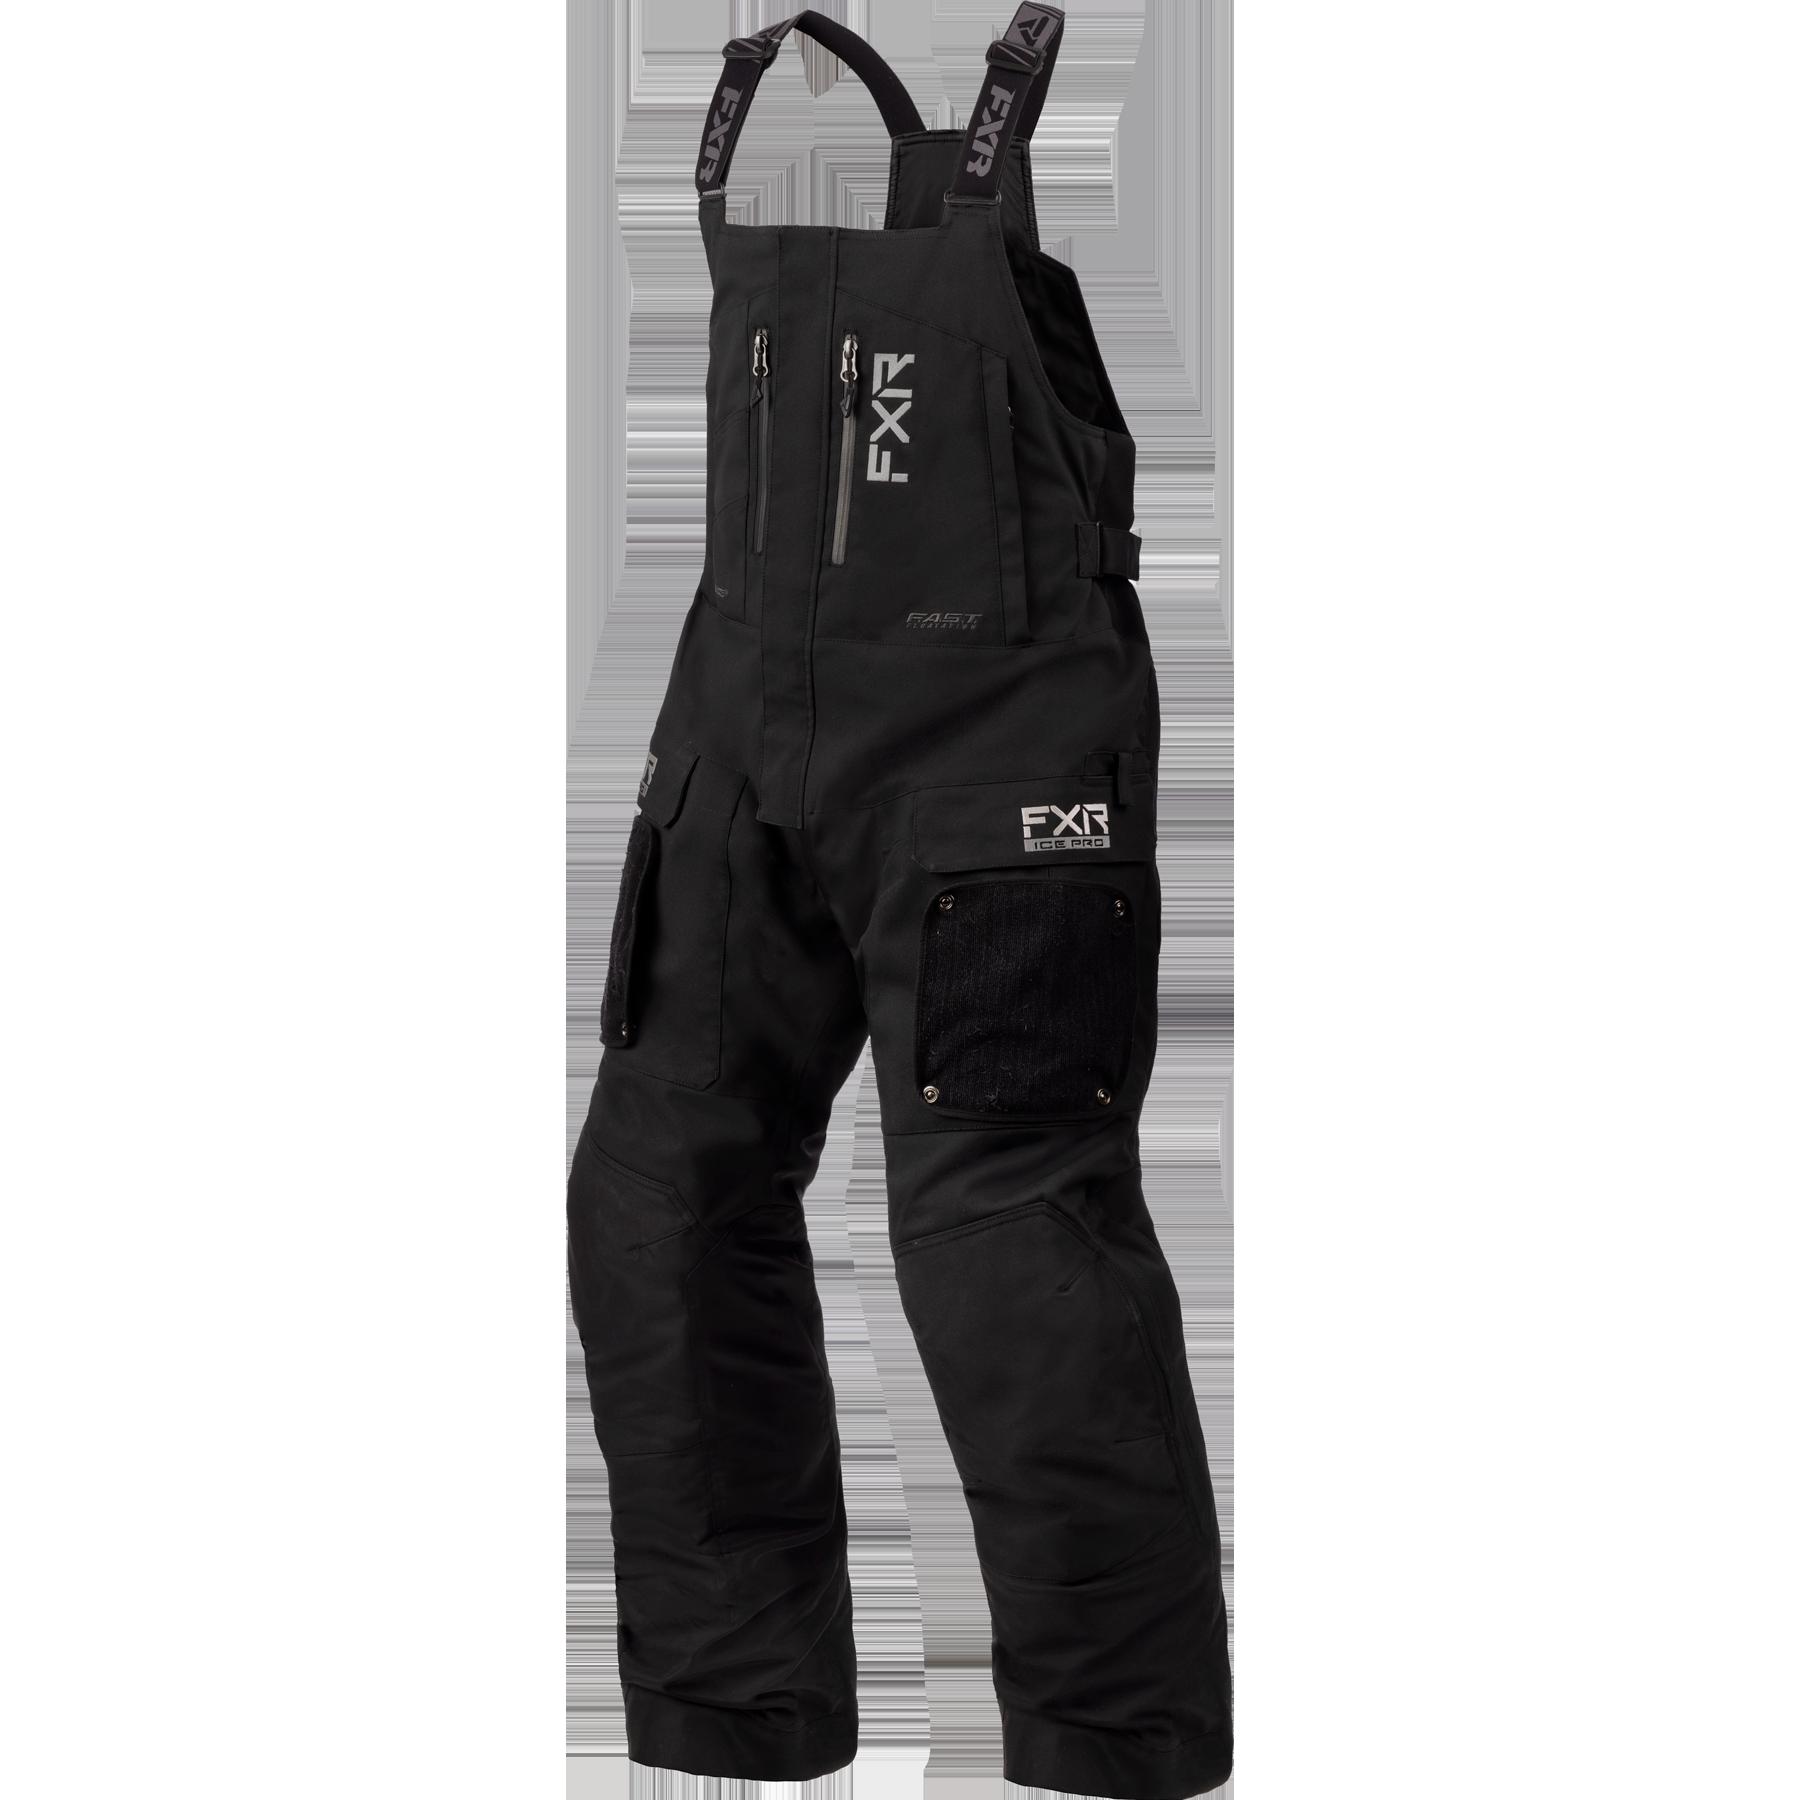 Expedition X Ice Pro 22 KI 3-9